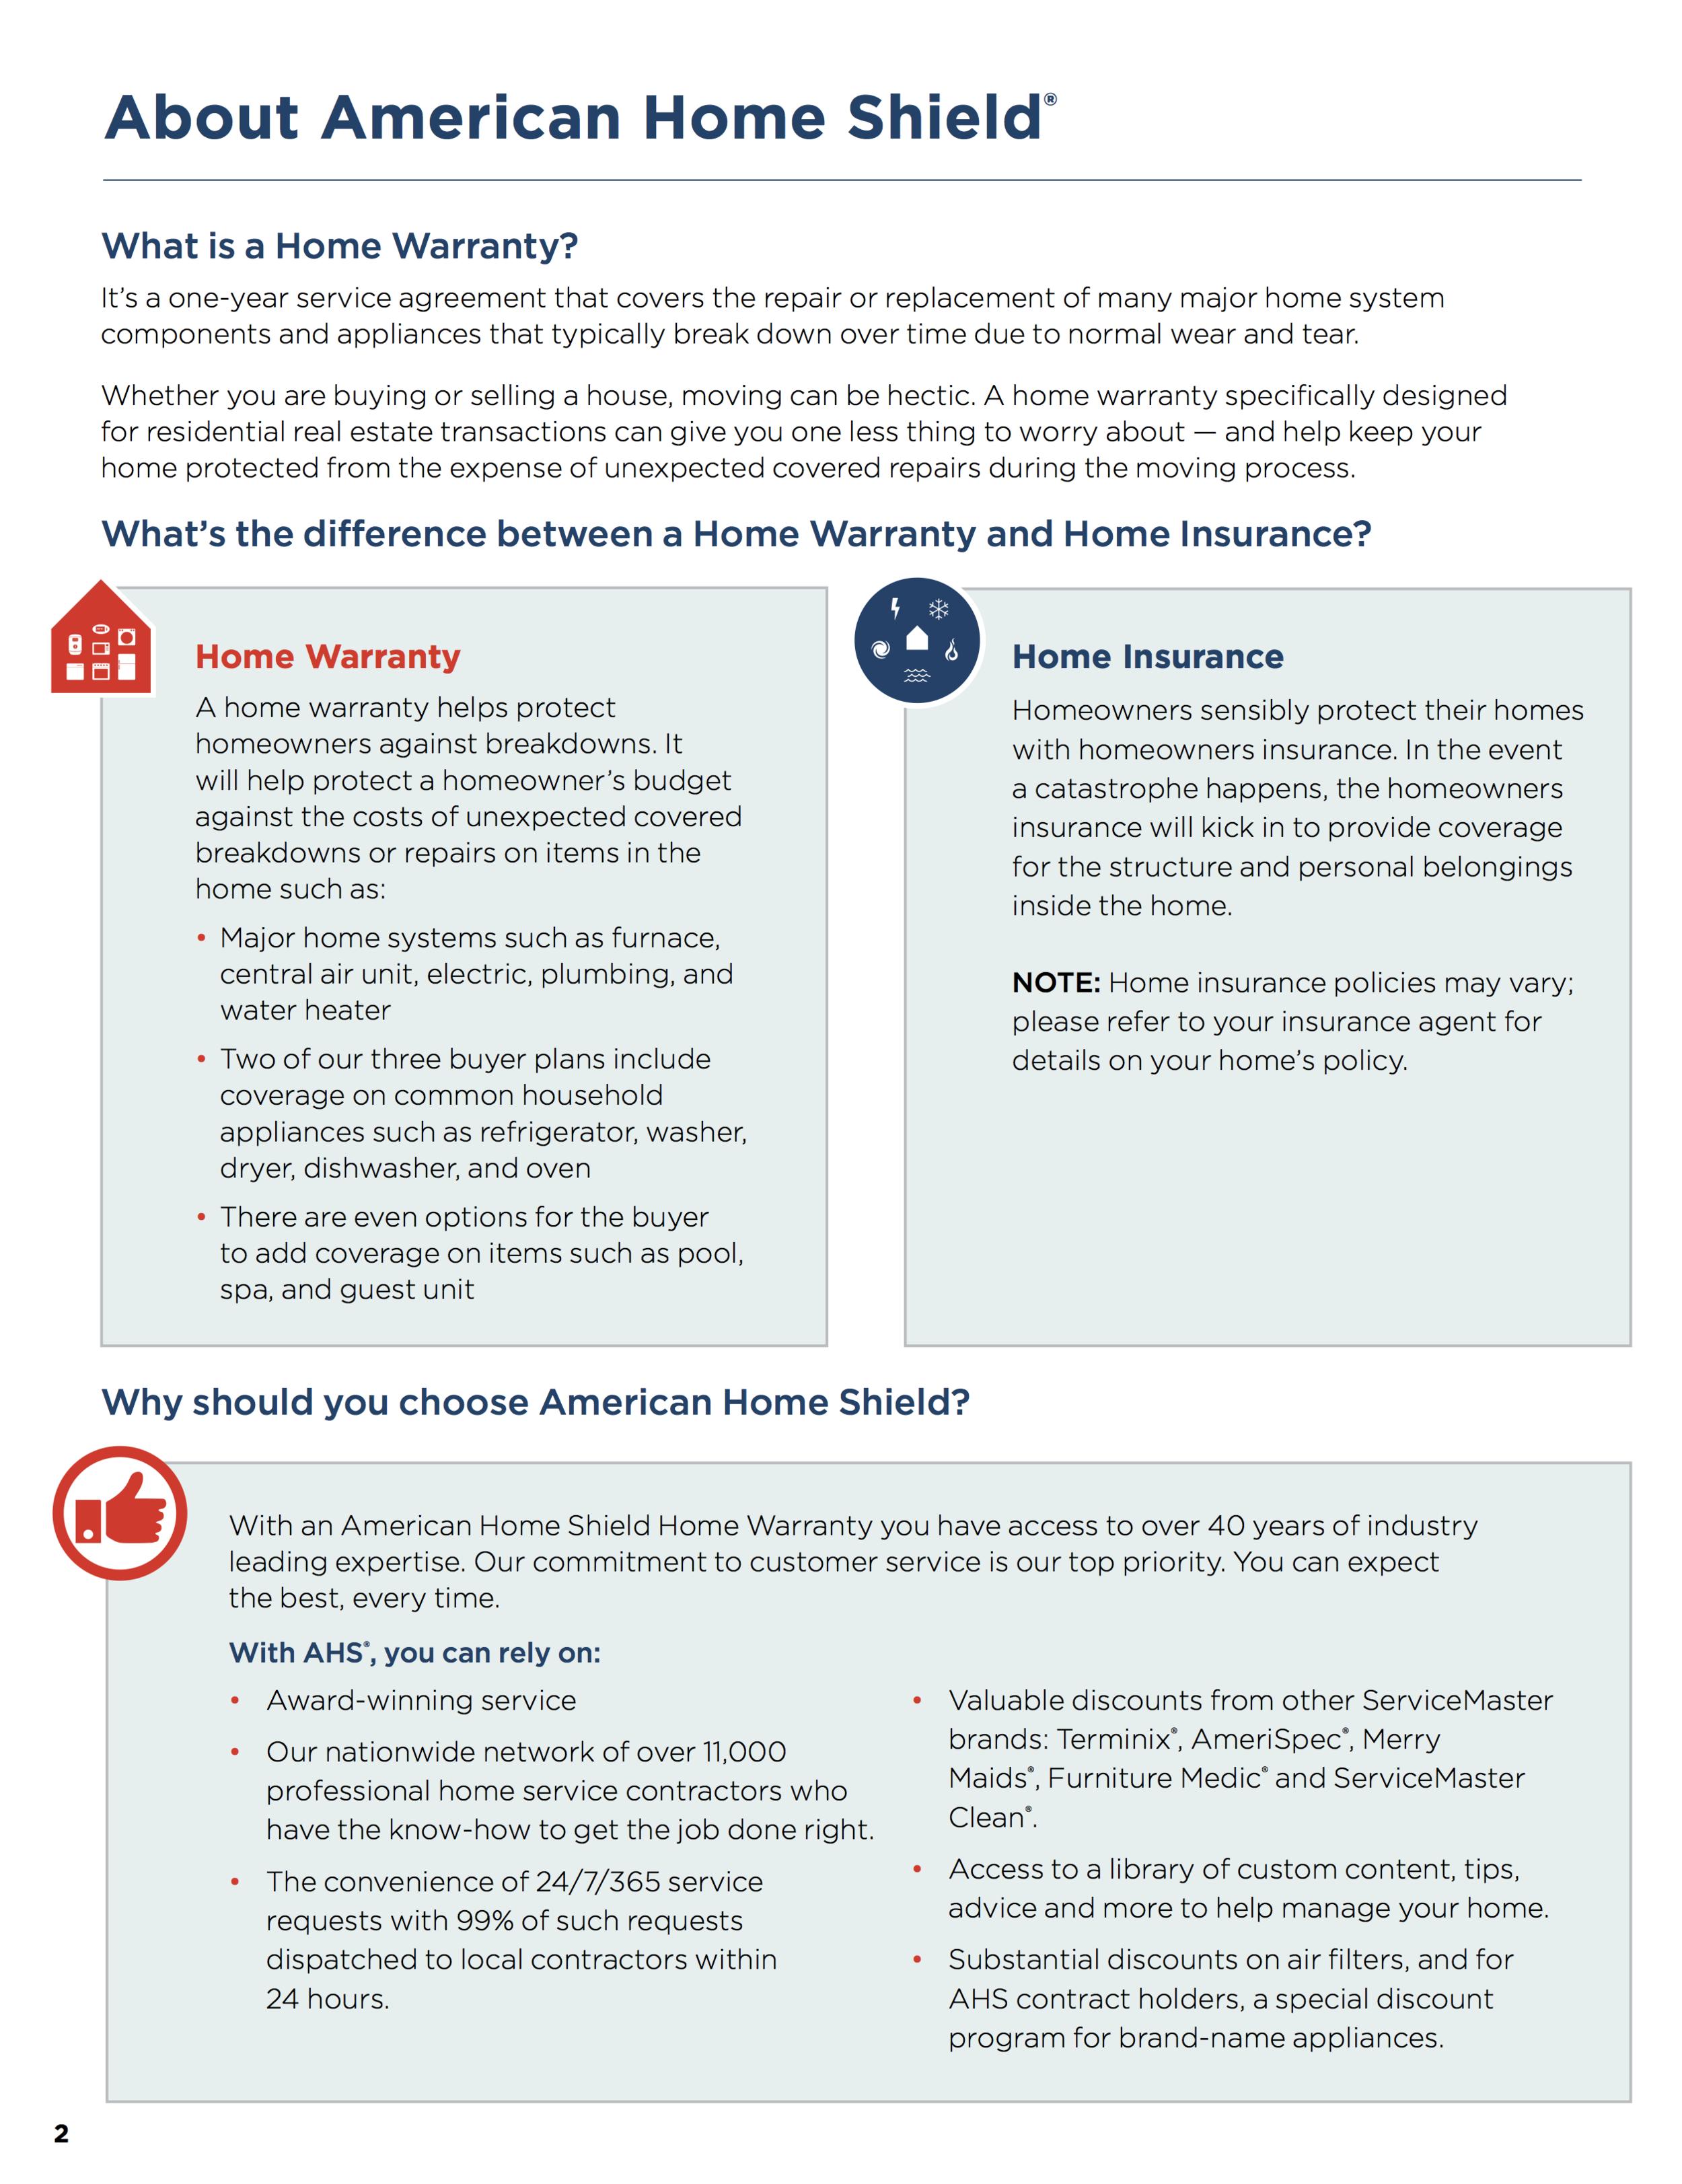 2017 AHS home warranty plans - real estate 2.png